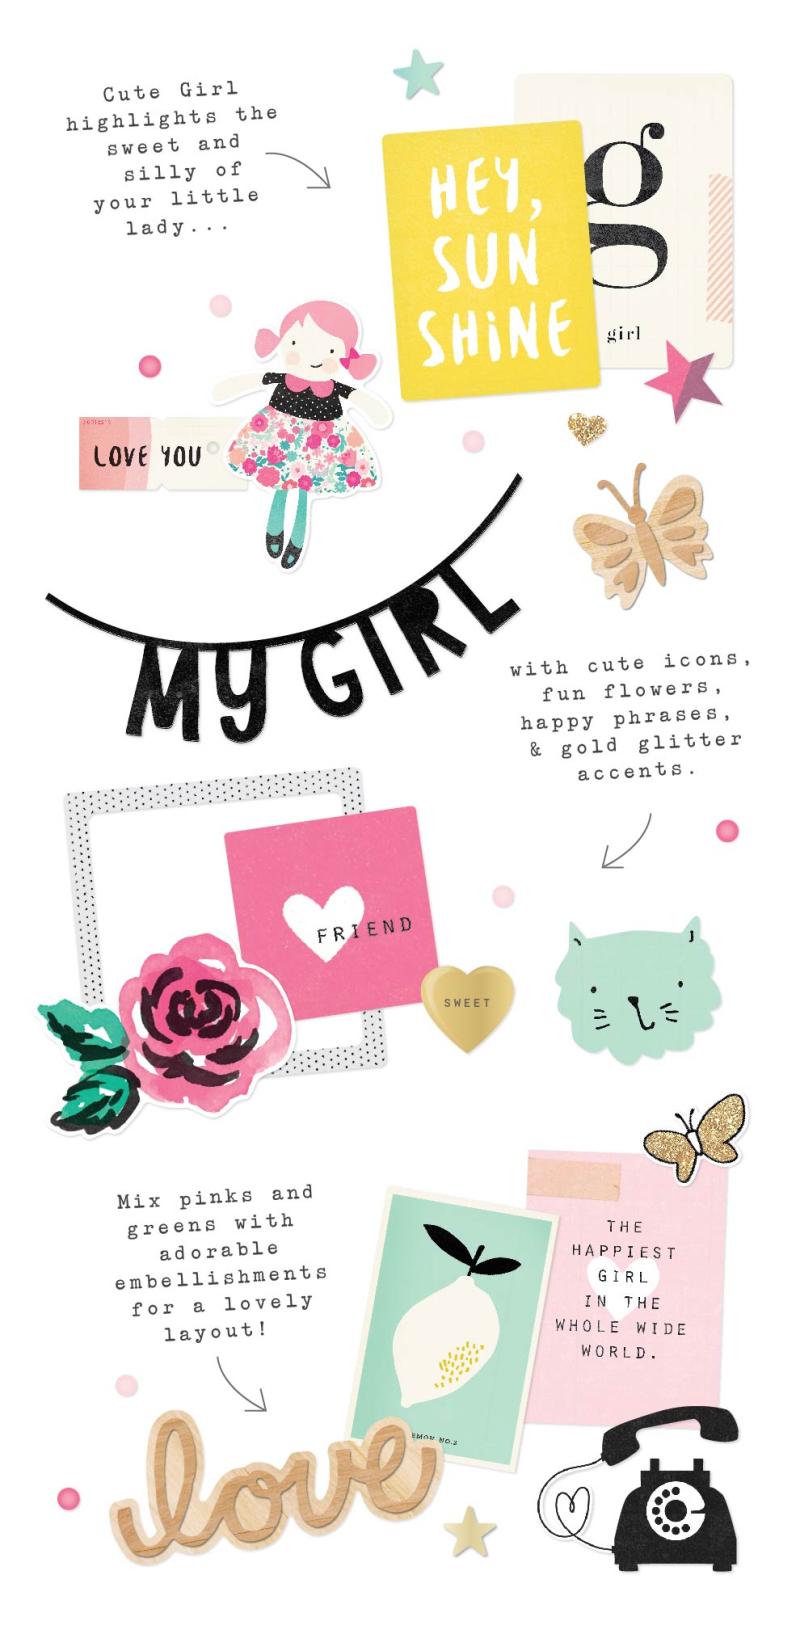 Cute girl_highlights